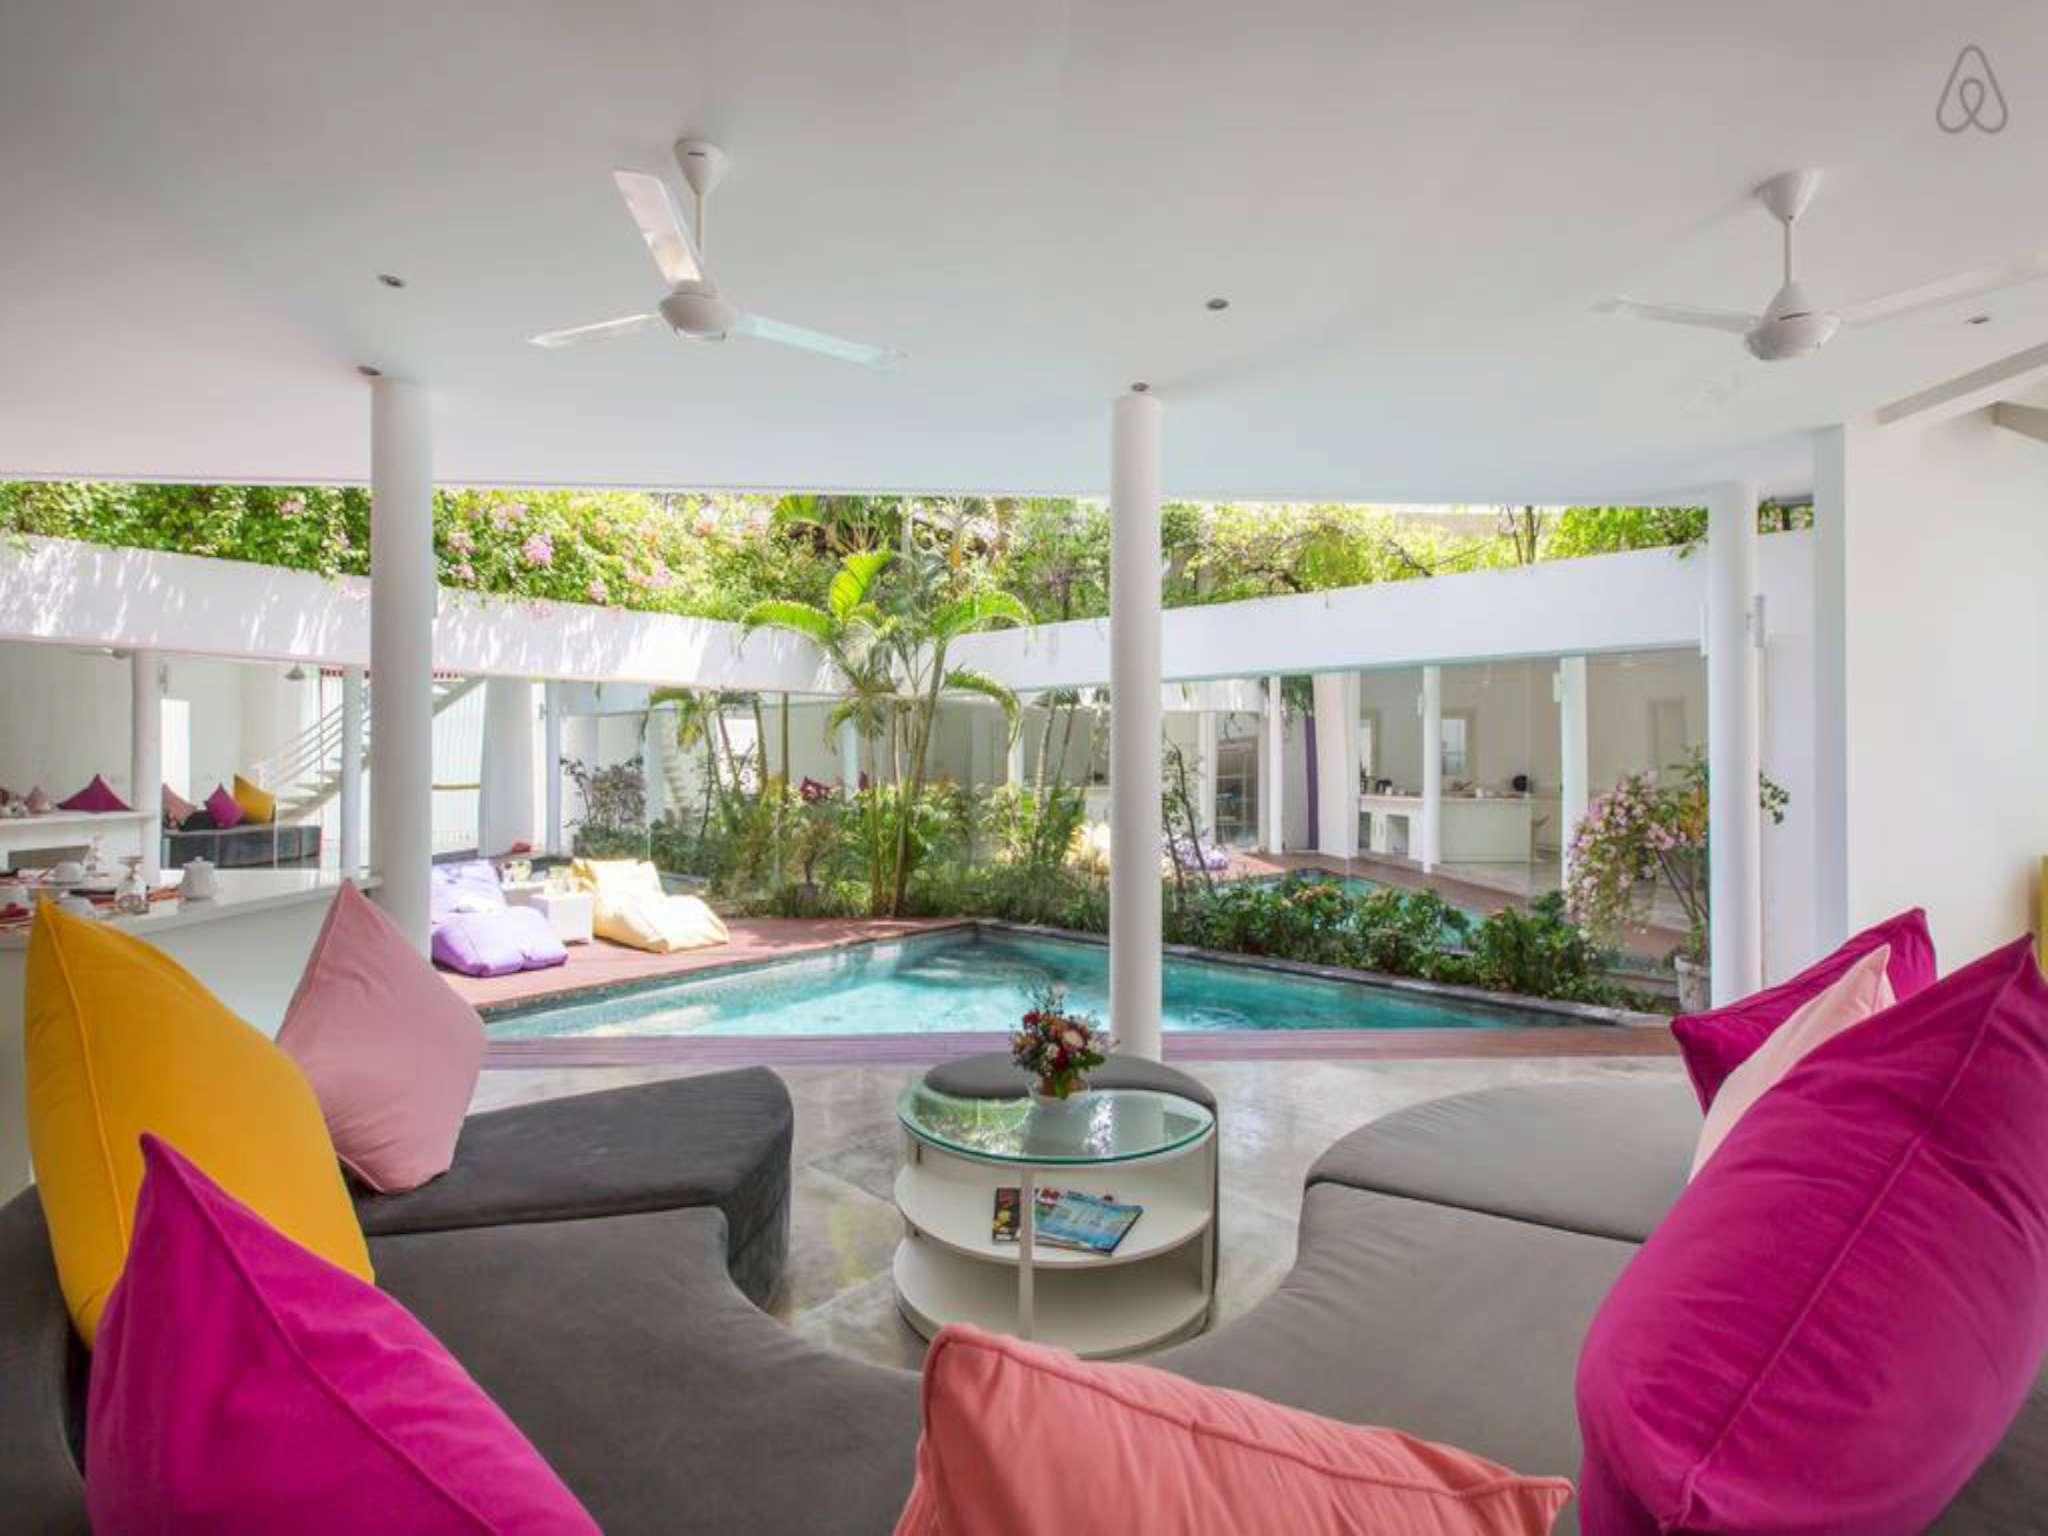 3 Bedroom Luxury Villa 2 LA